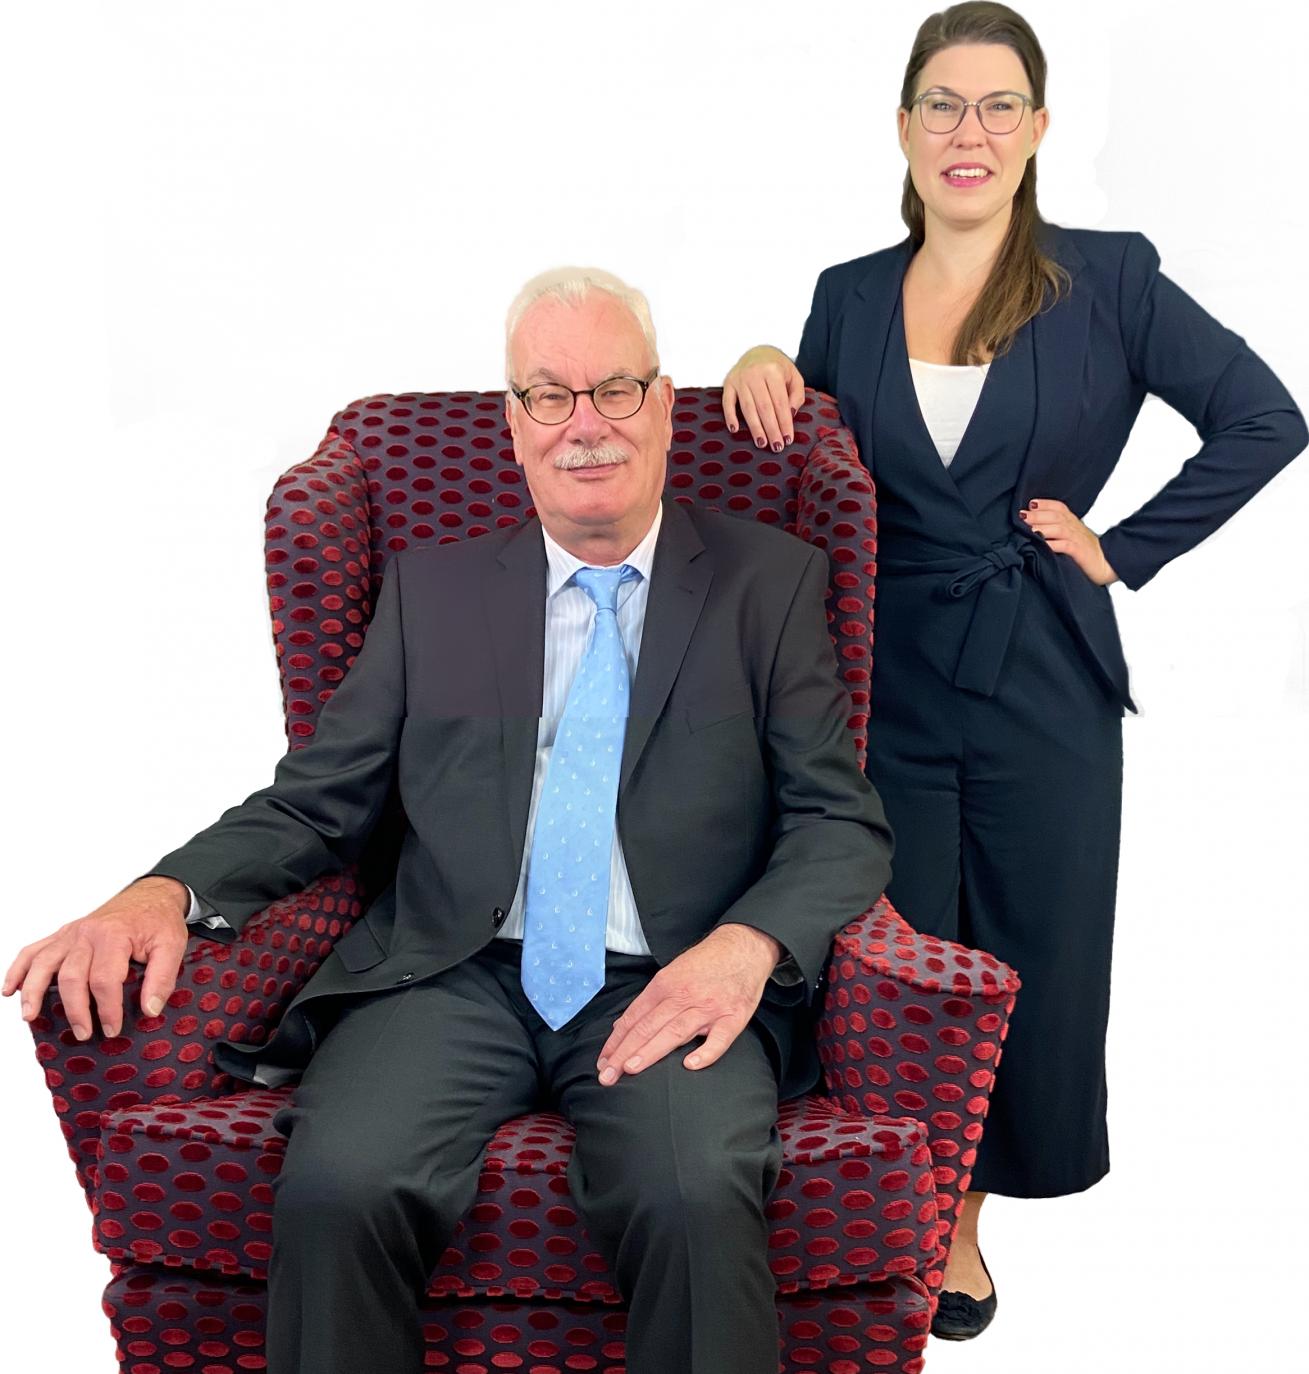 Rechtsanwalt Fanselau und Rechtsanwältin Hellwig